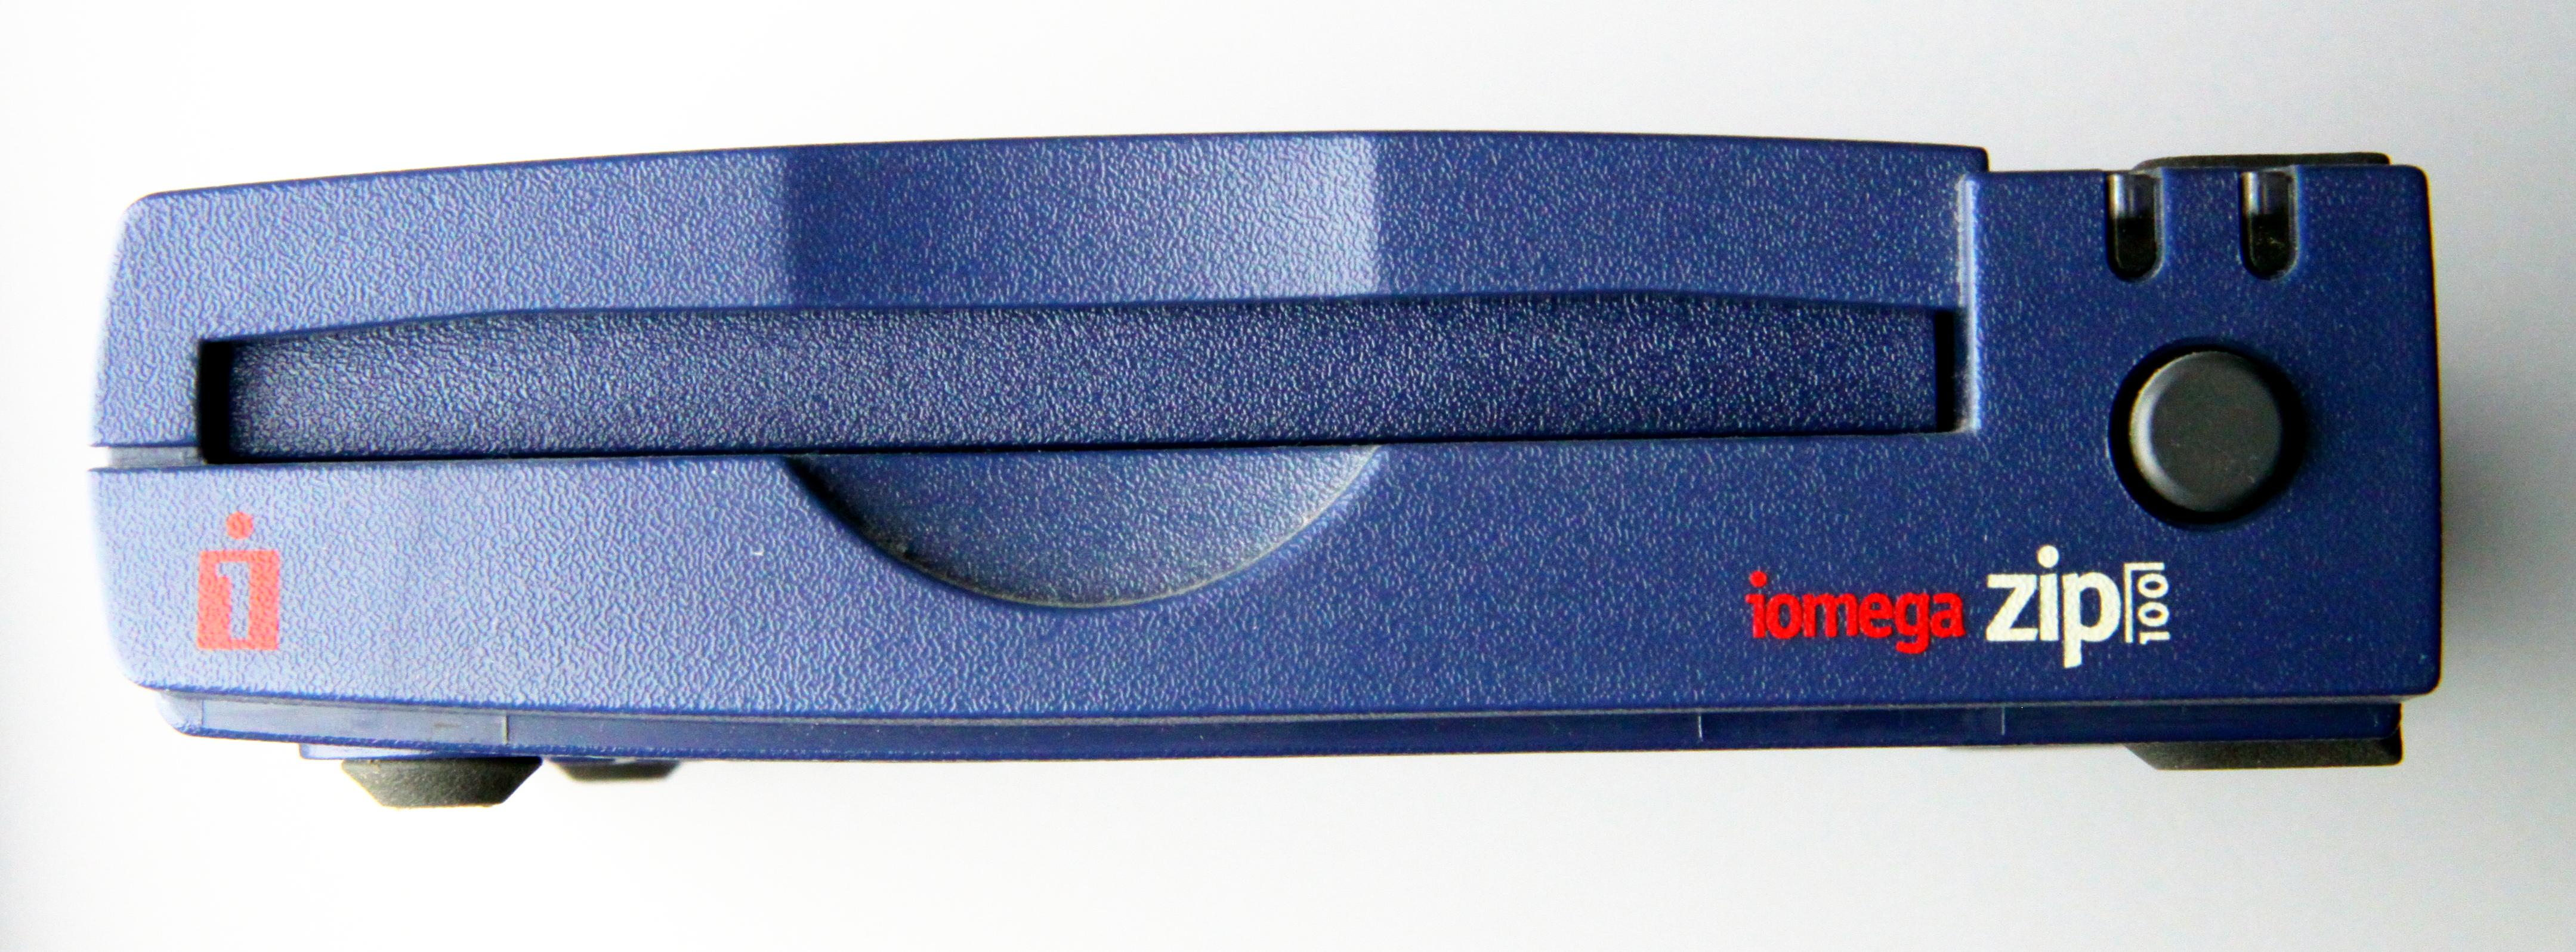 Zip Drive | www.imgkid.com - The Image Kid Has It!